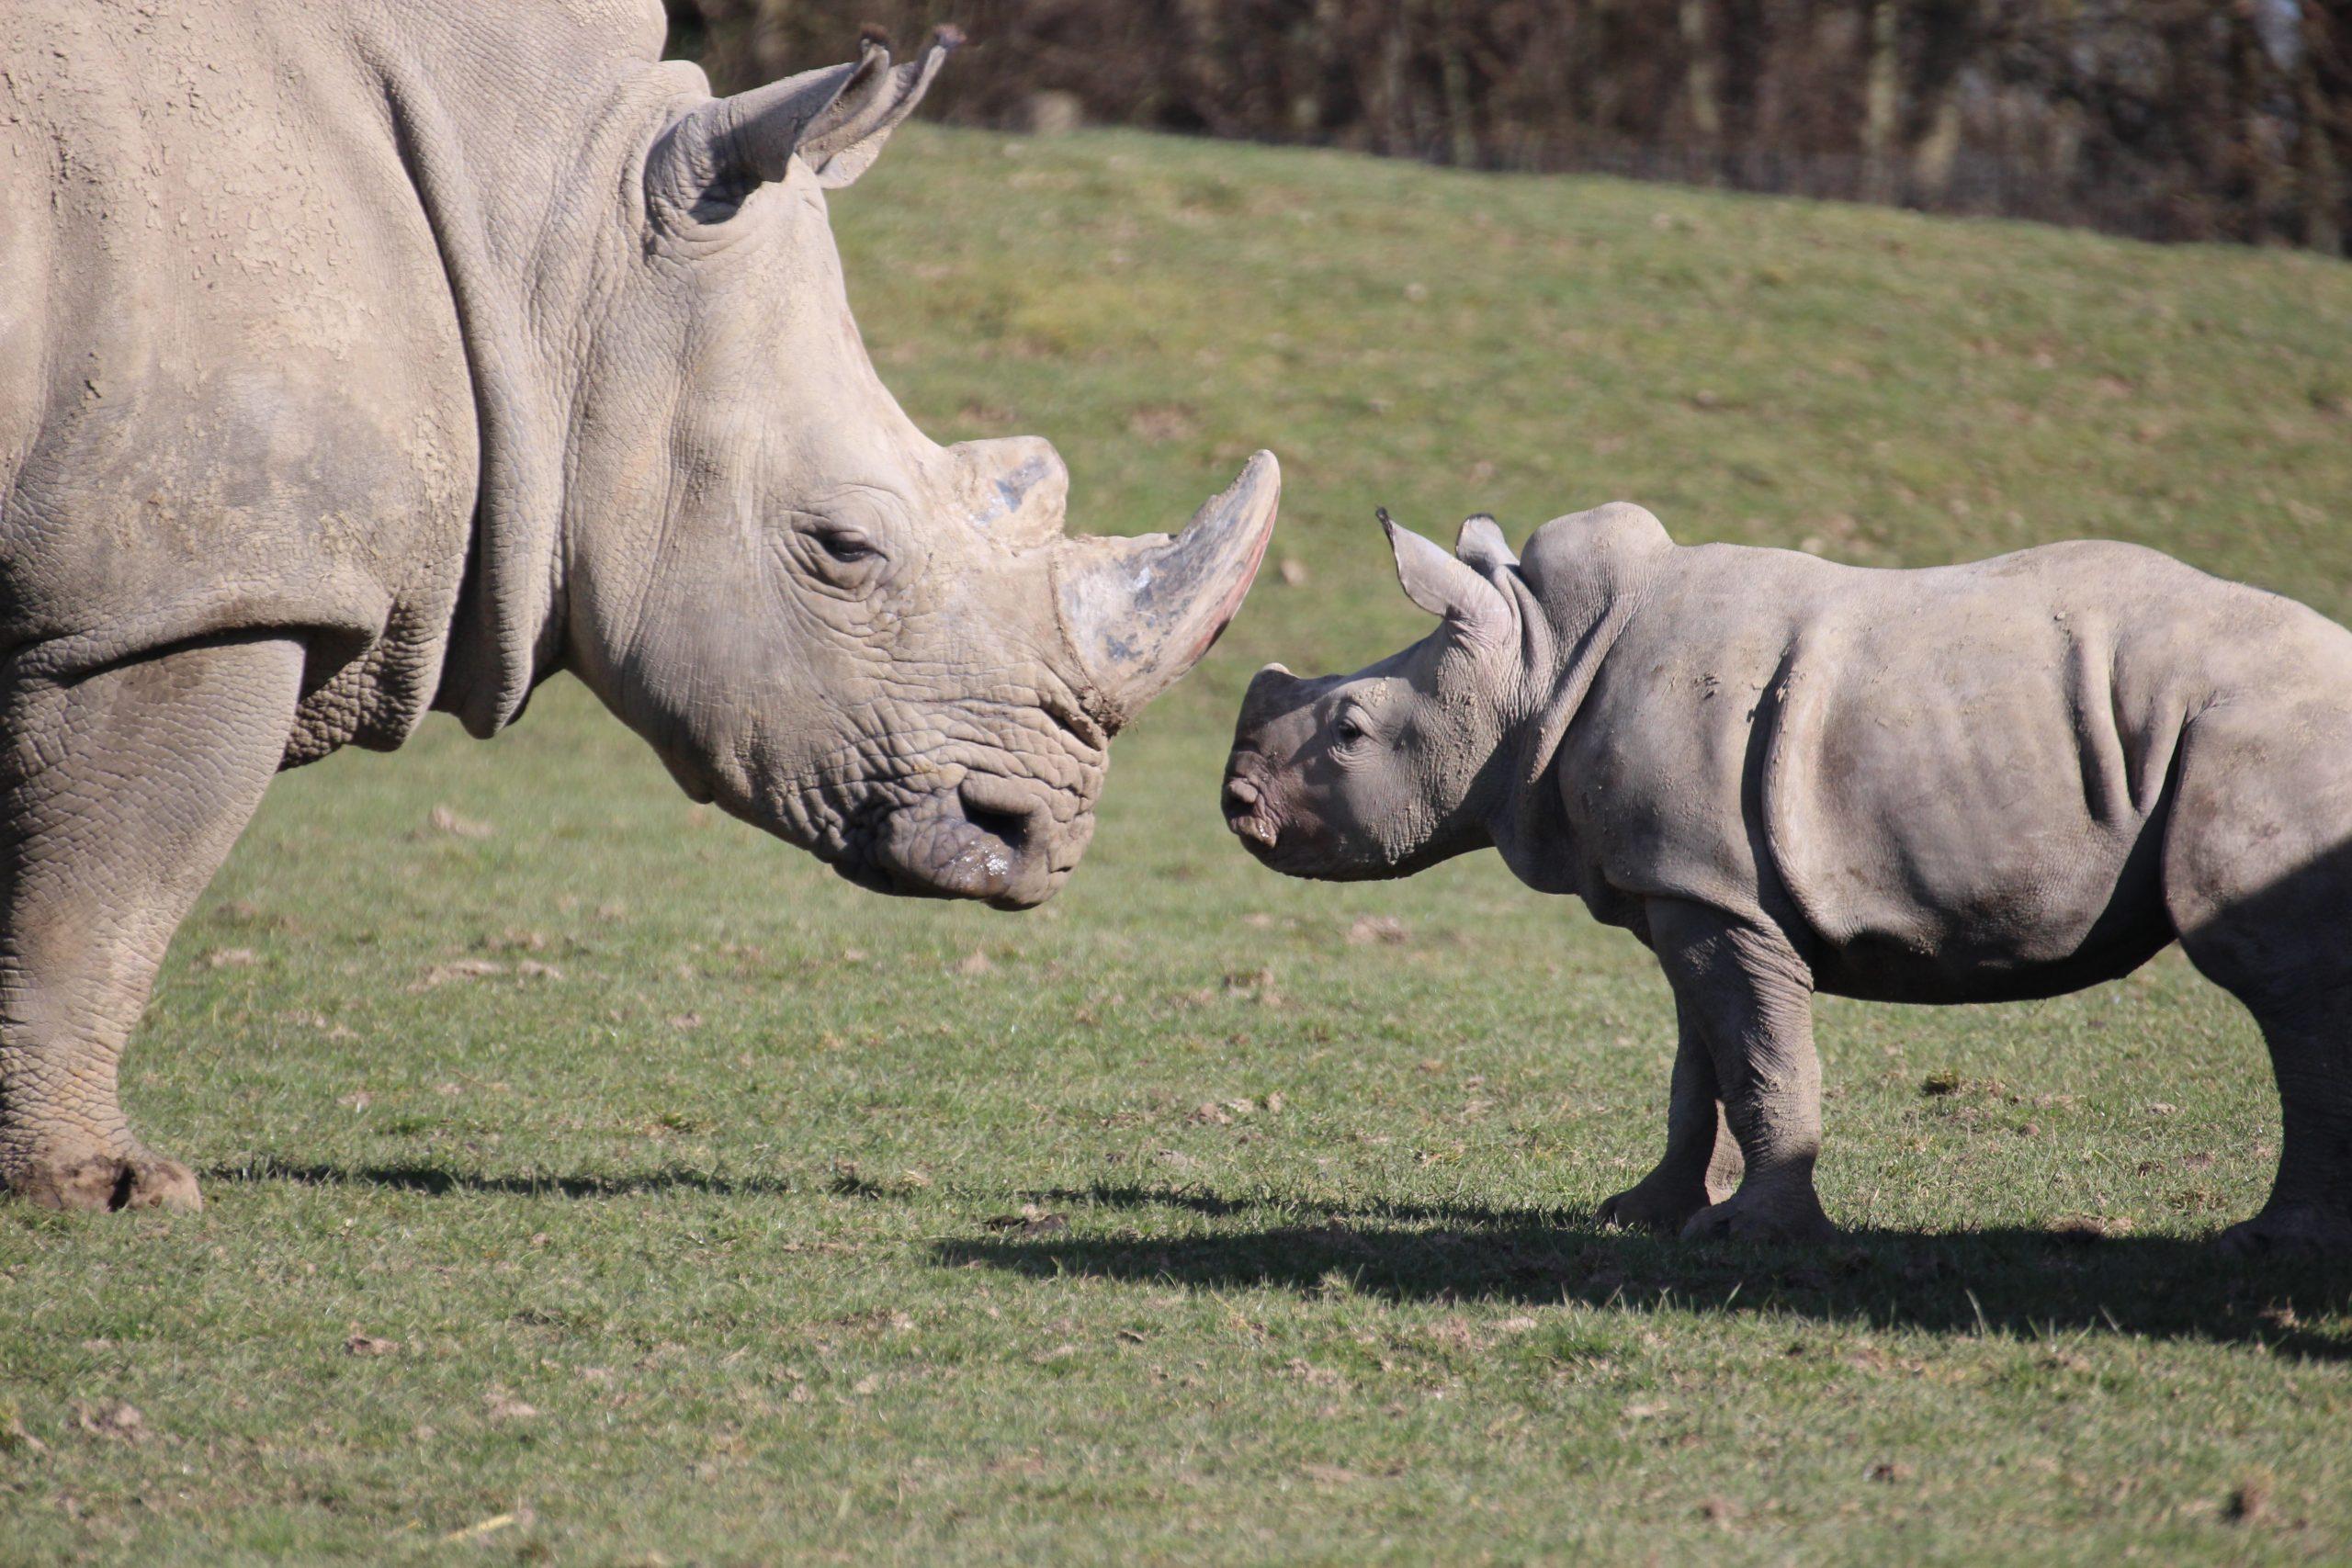 Naissance d'un Bébé Rhinocéros Blanc  !!!